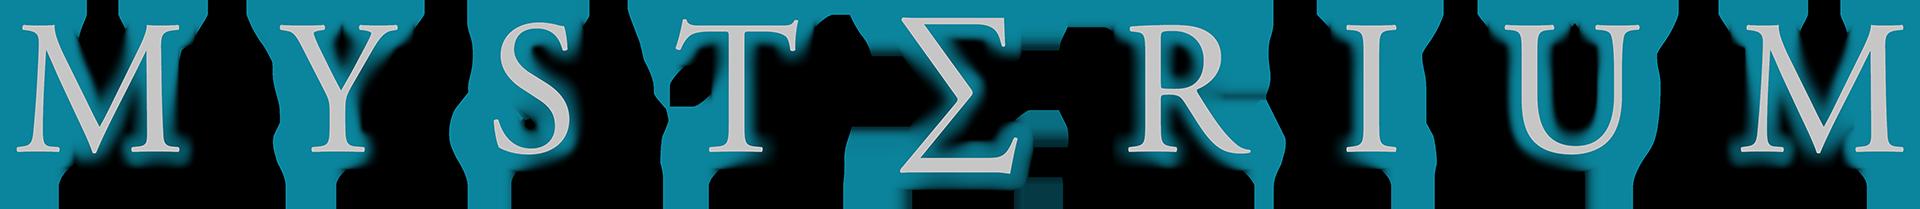 logomysterium1.png